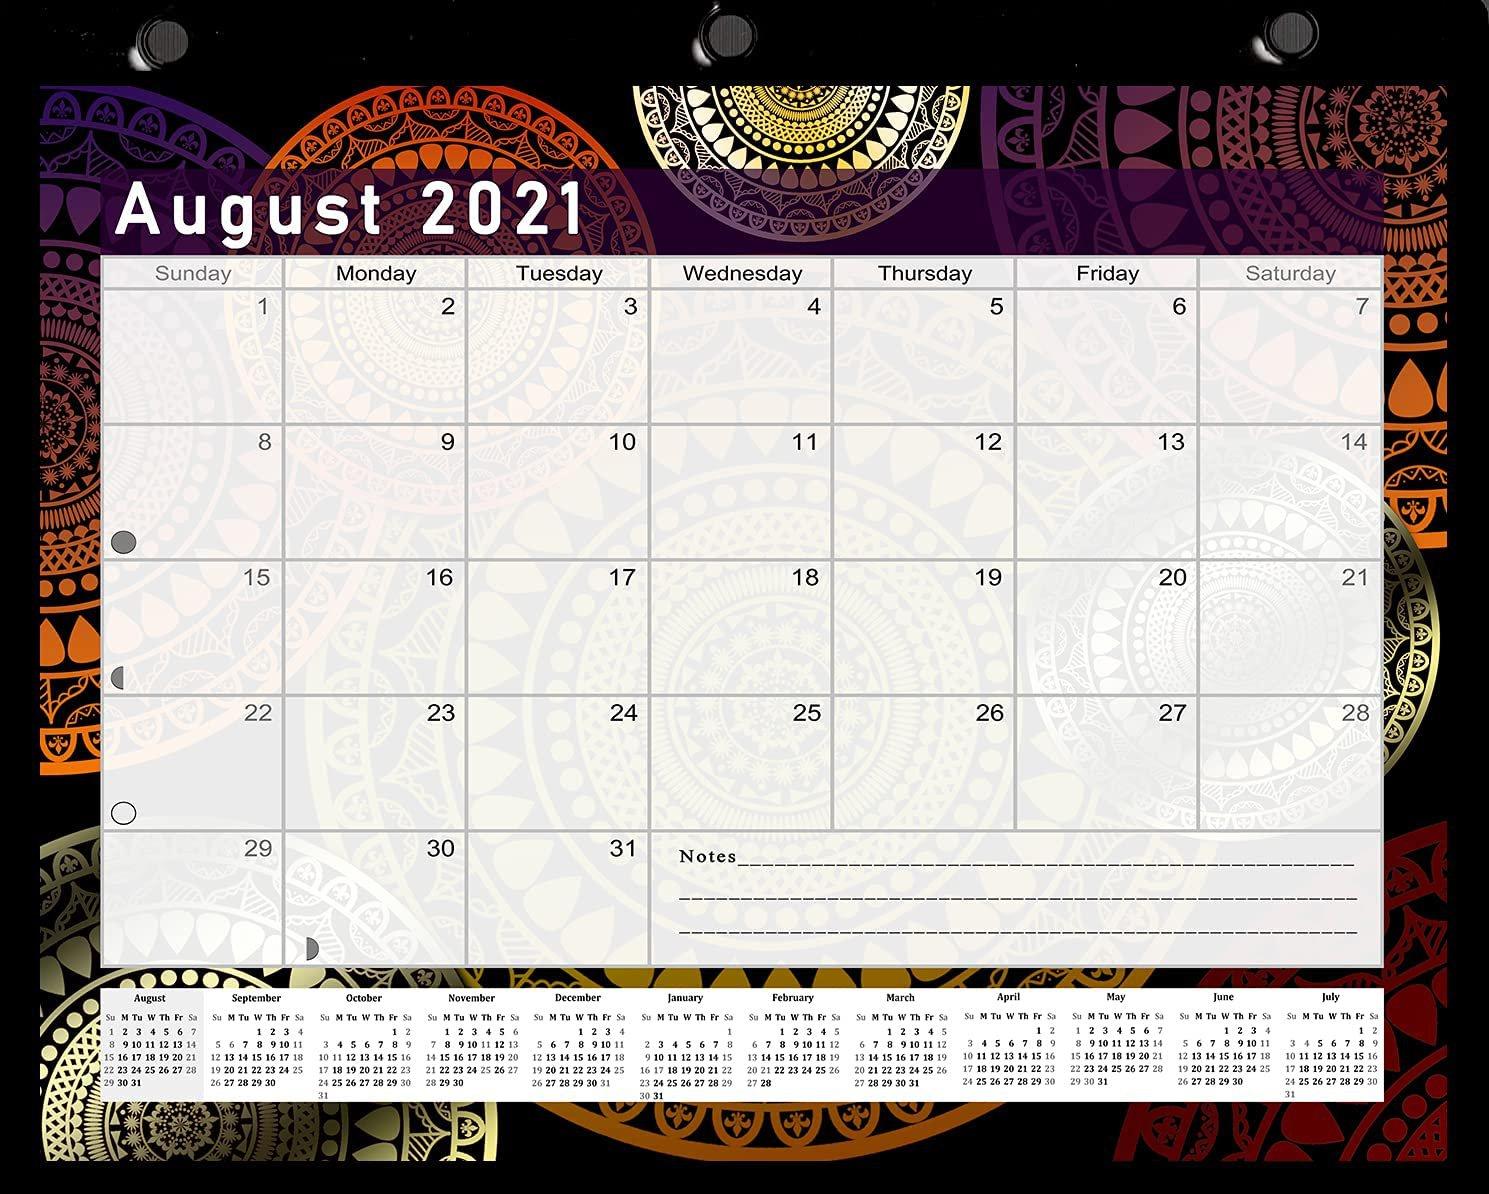 2021-2022 Academic Year 12 Months Student Calendar/Planner -v015